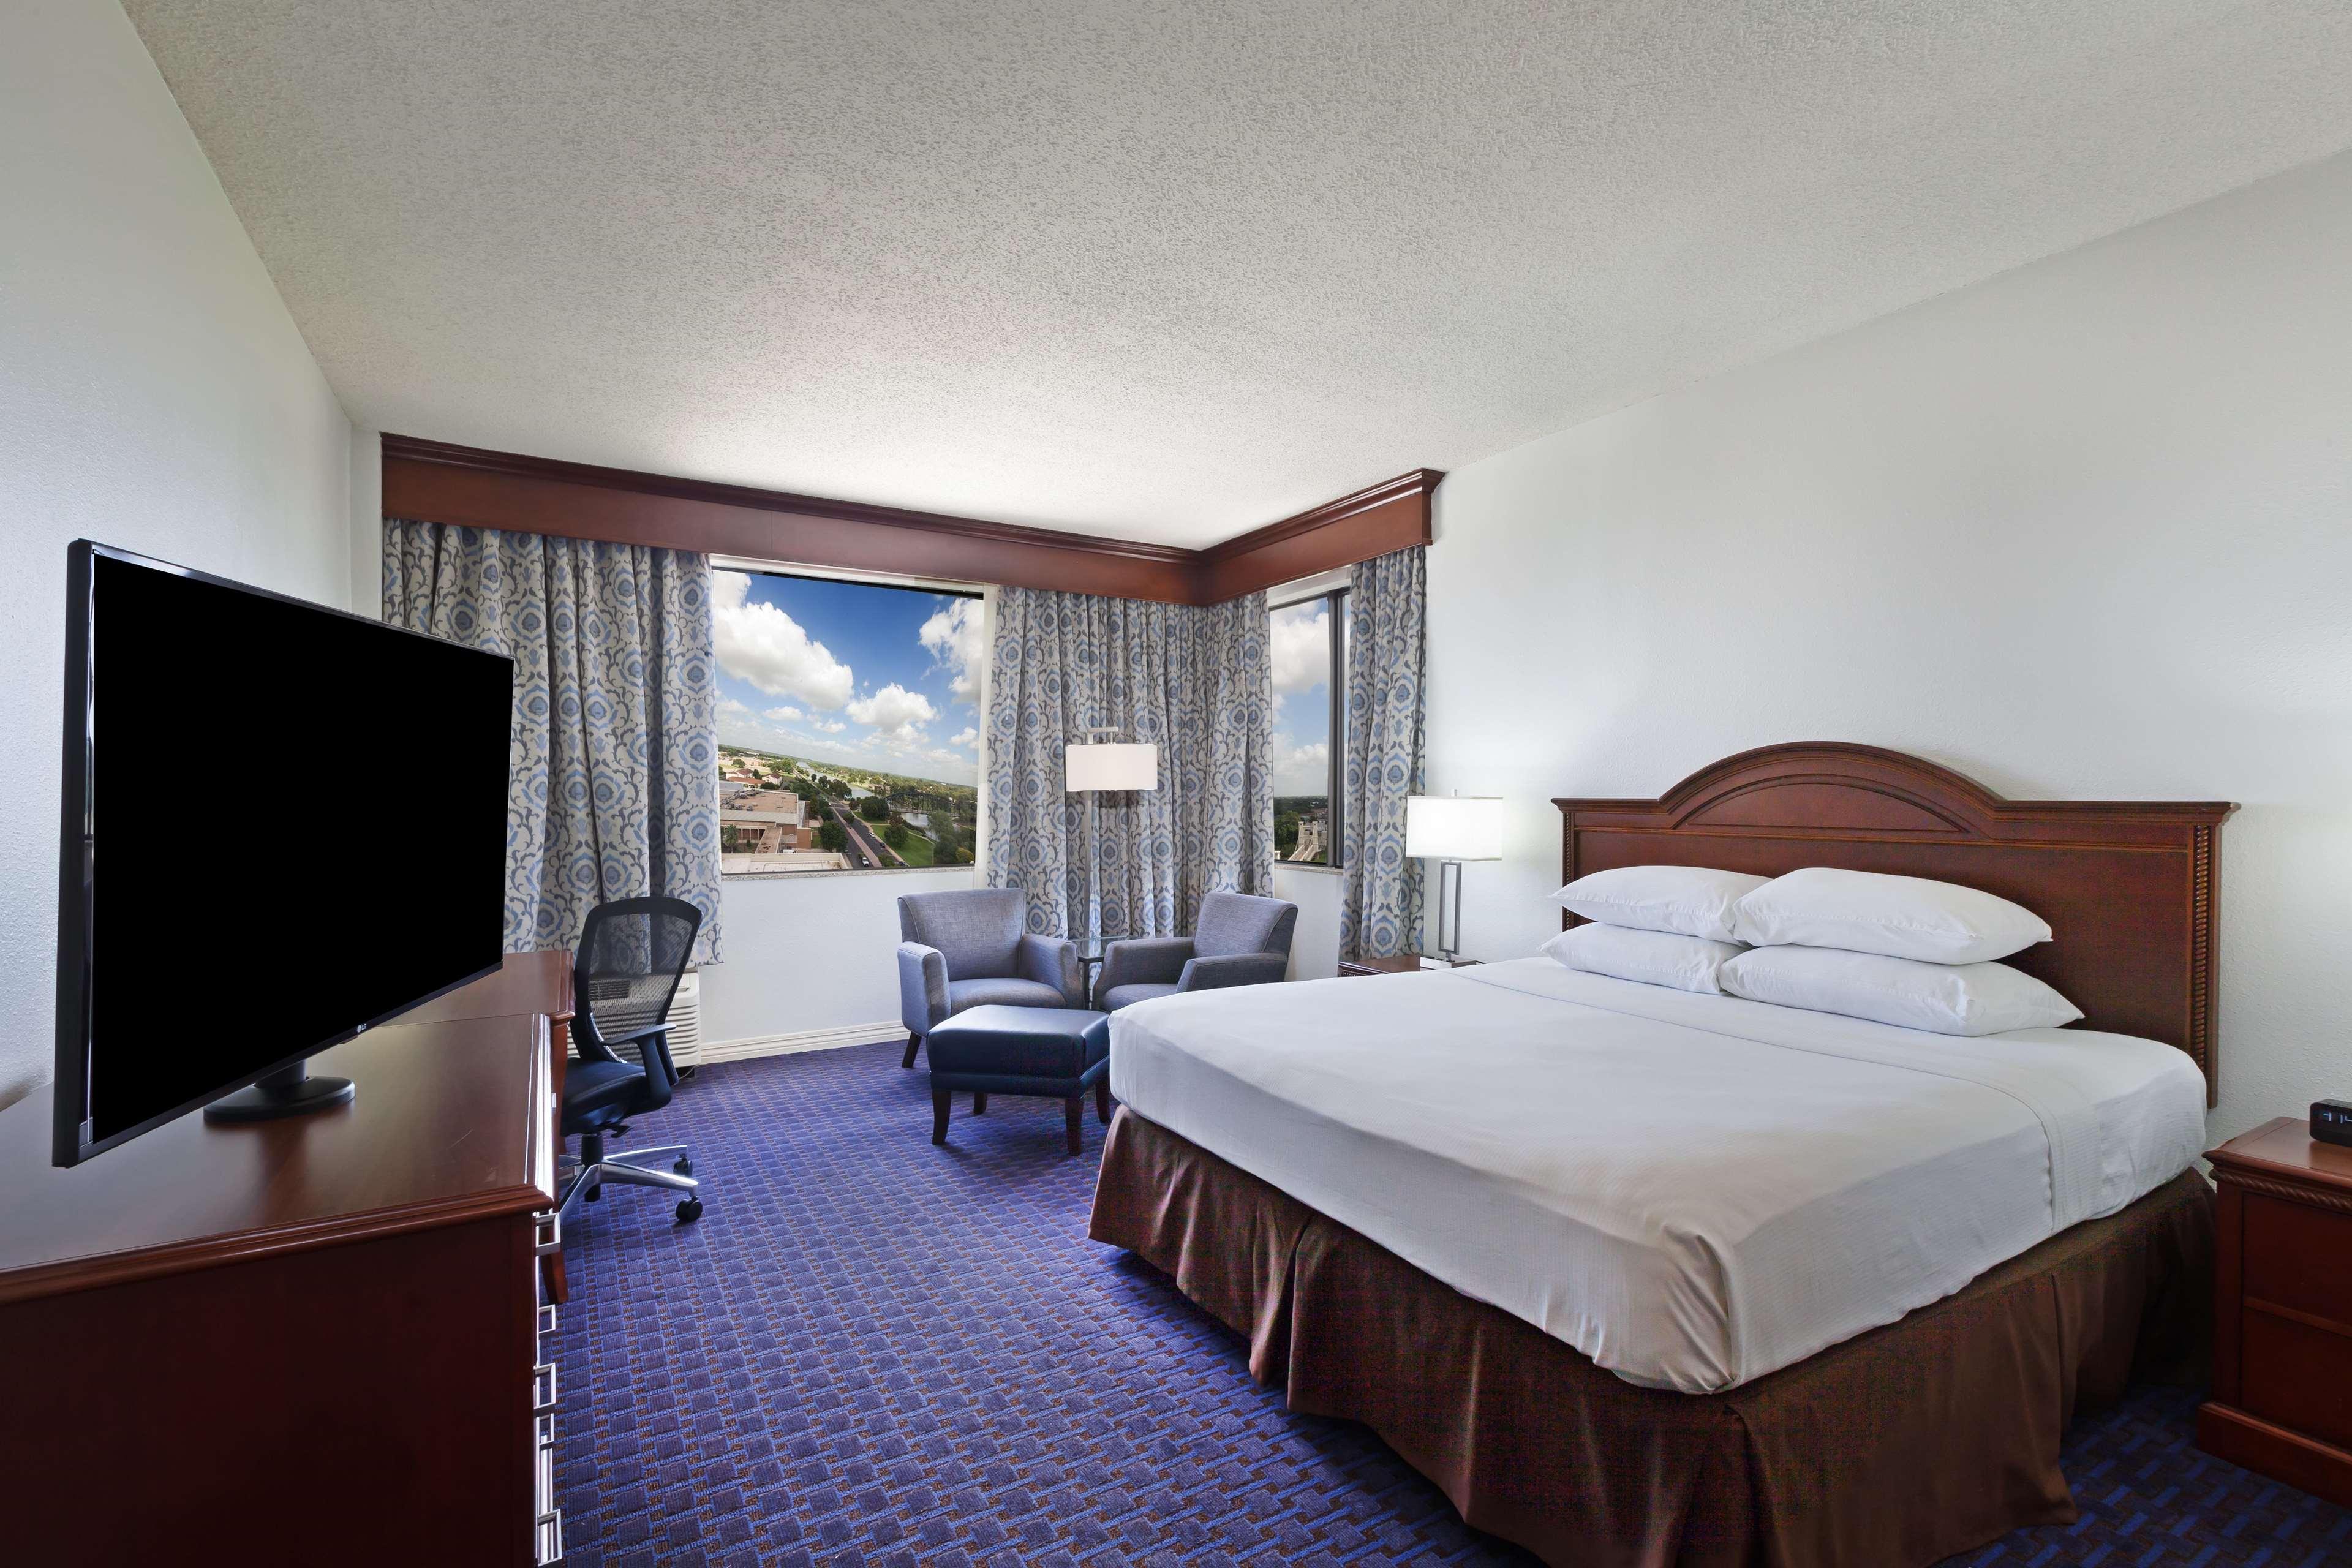 Hilton Waco image 37